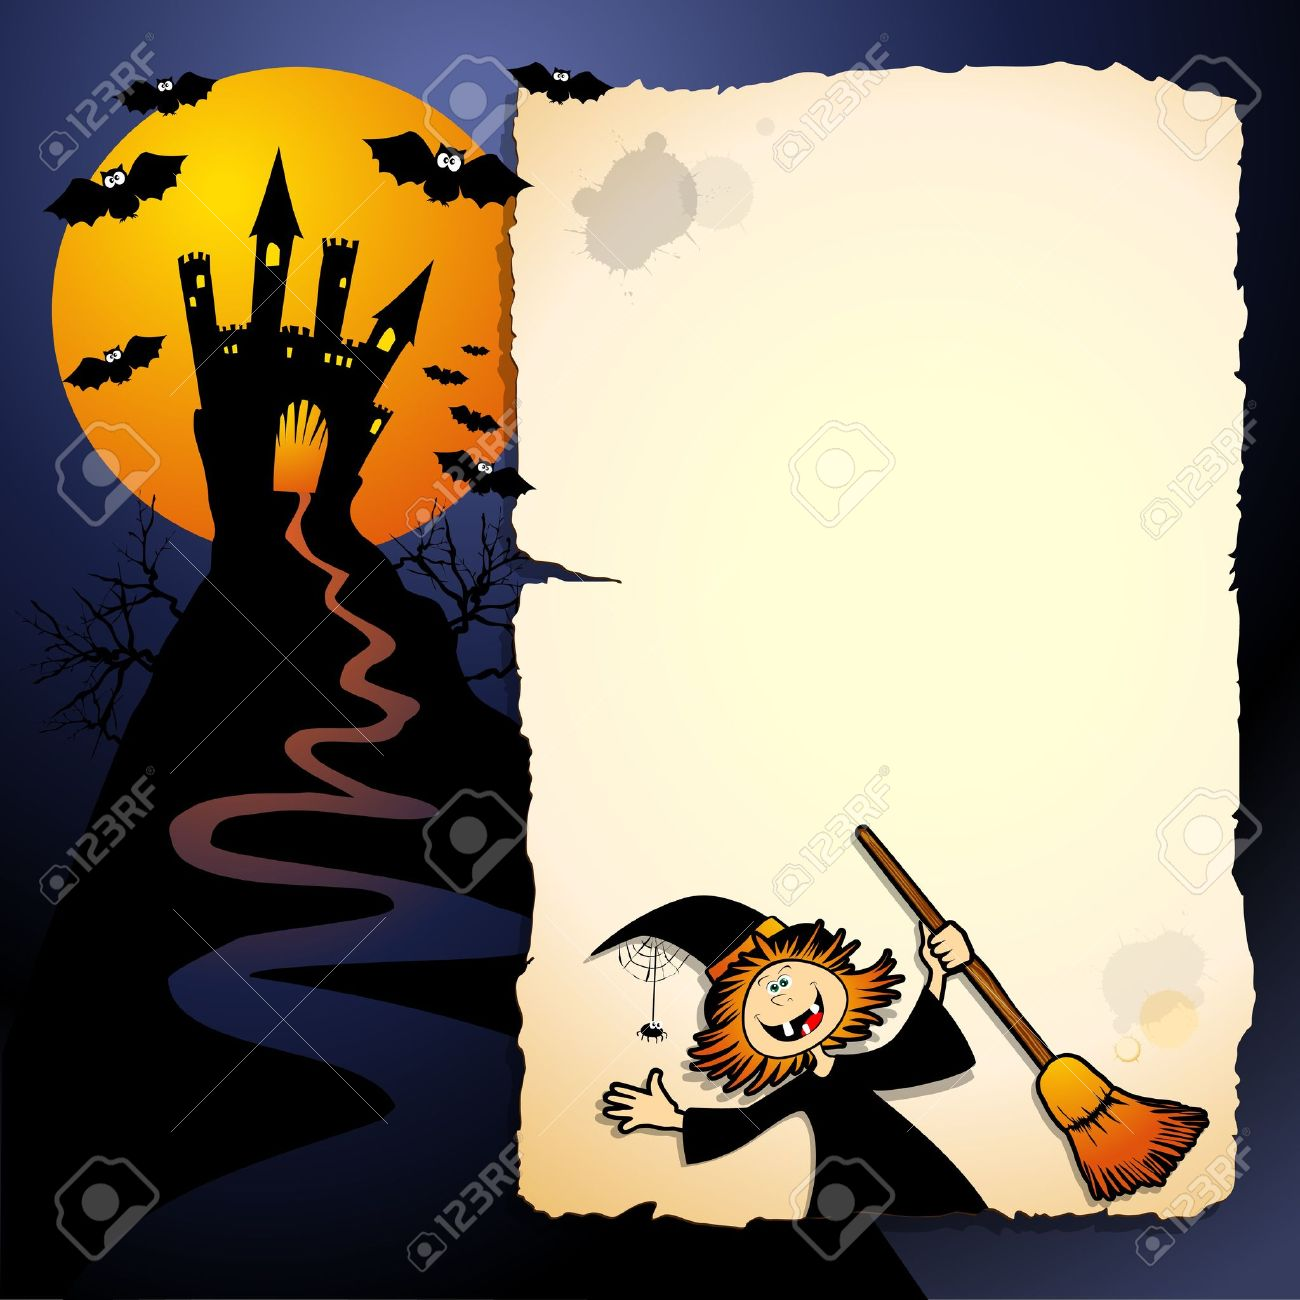 Halloween funny background, vector image - 10632171